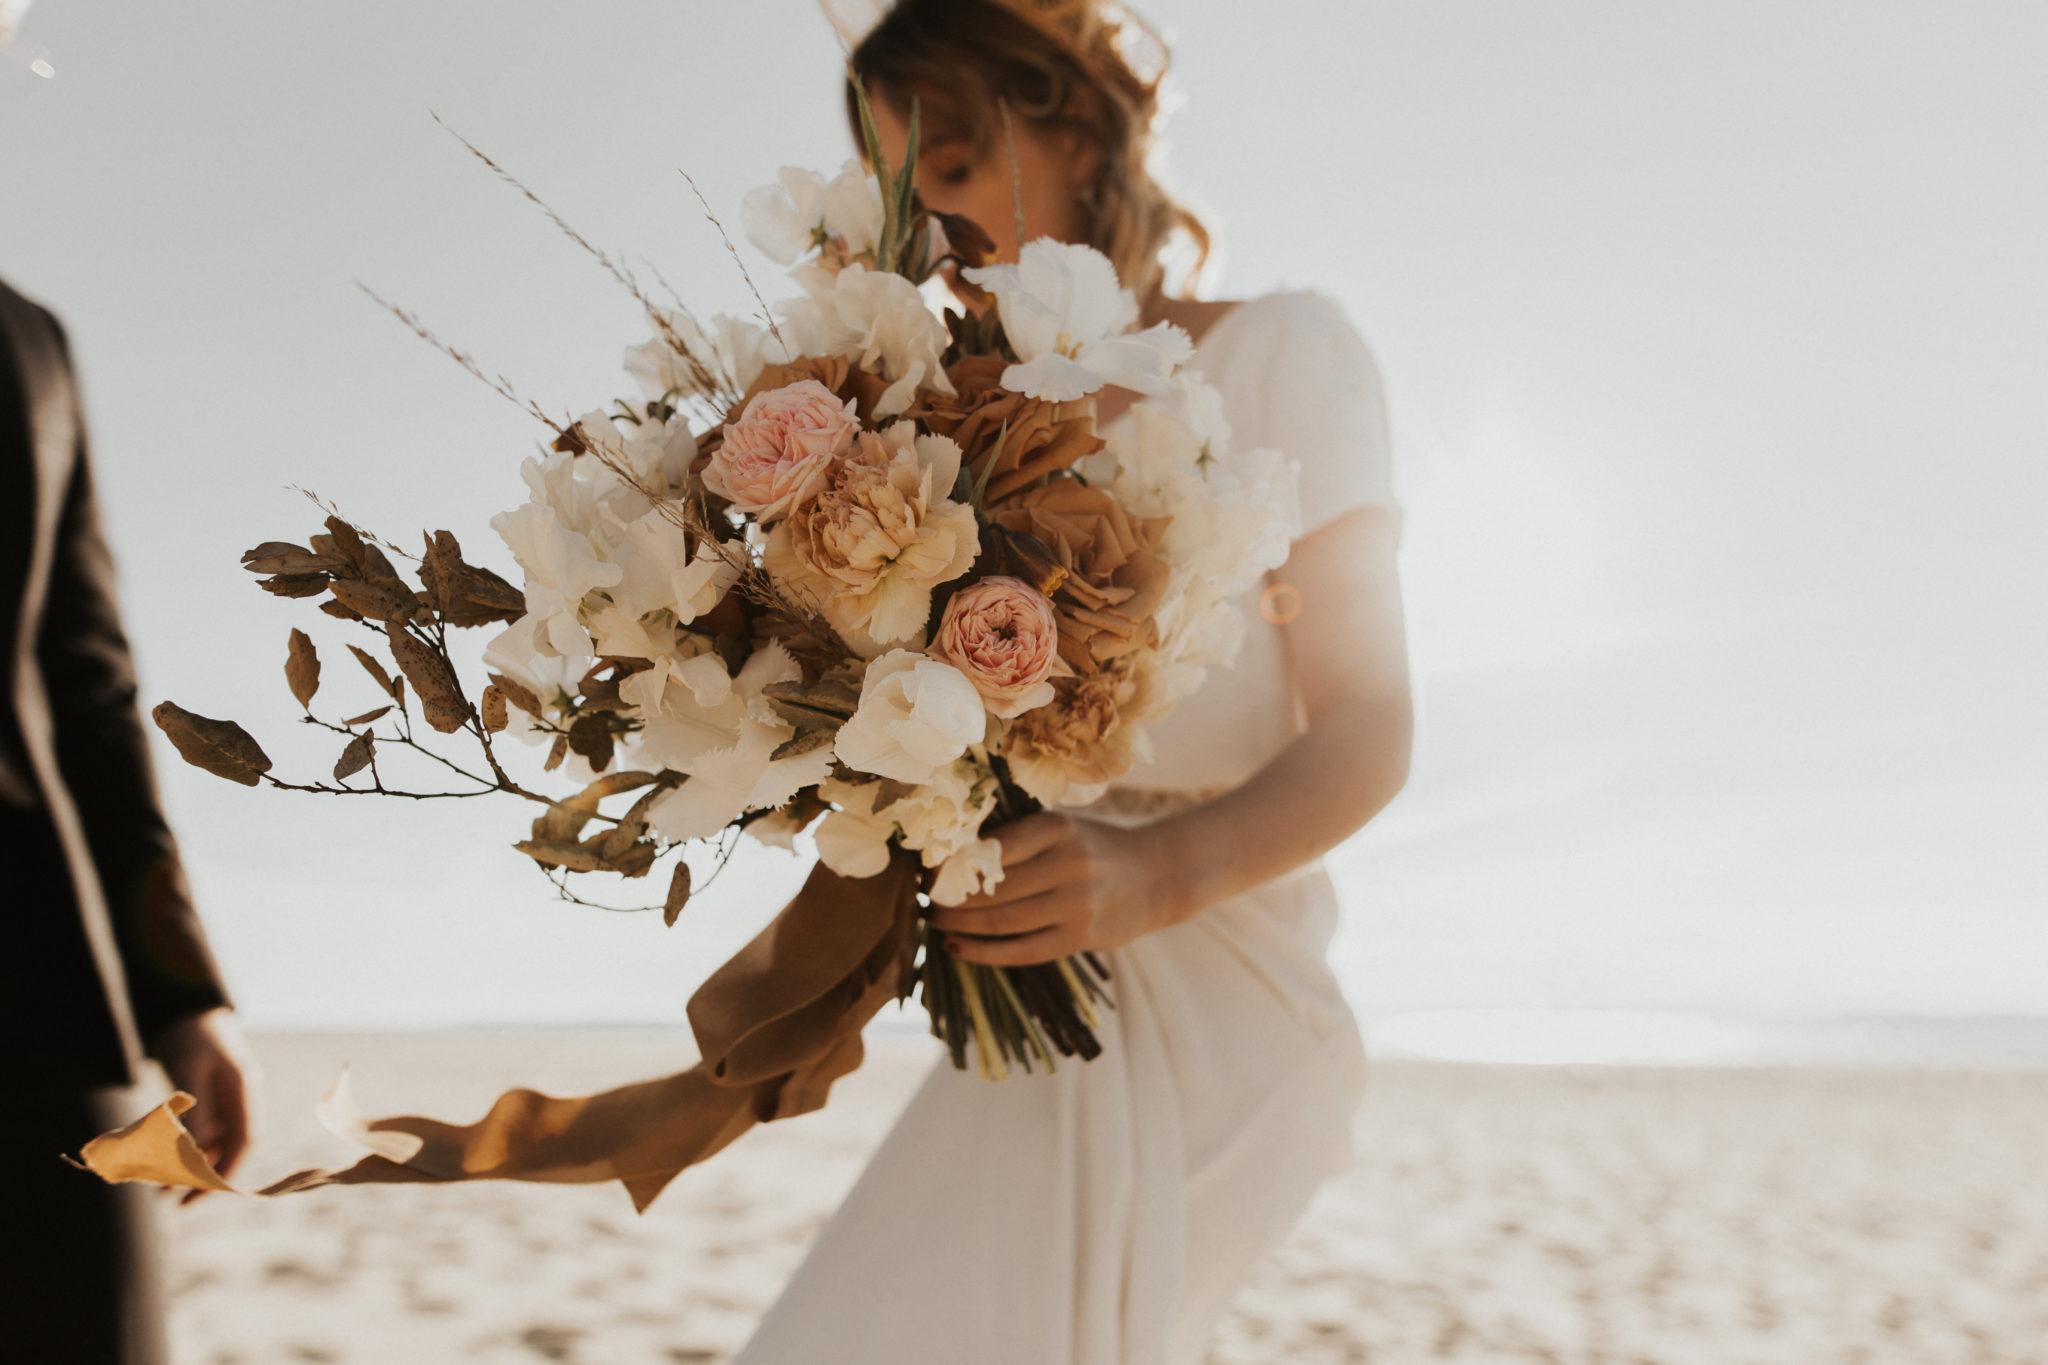 bassin-arcachon-mariage-inspiration-bouquet-mariee